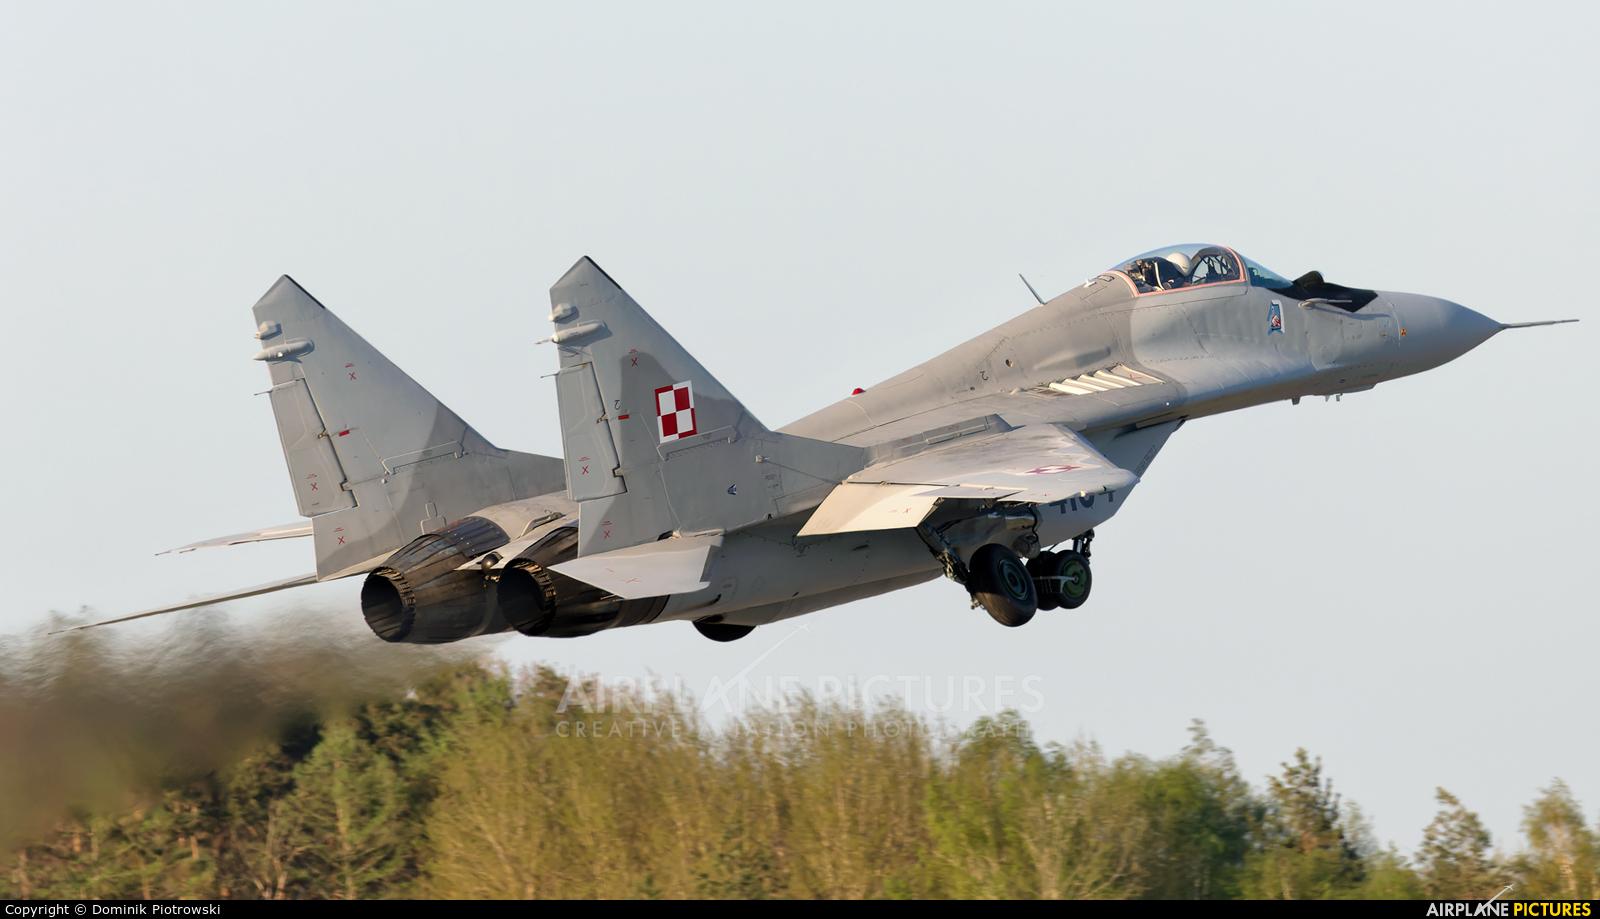 Poland - Air Force 4104 aircraft at Świdwin